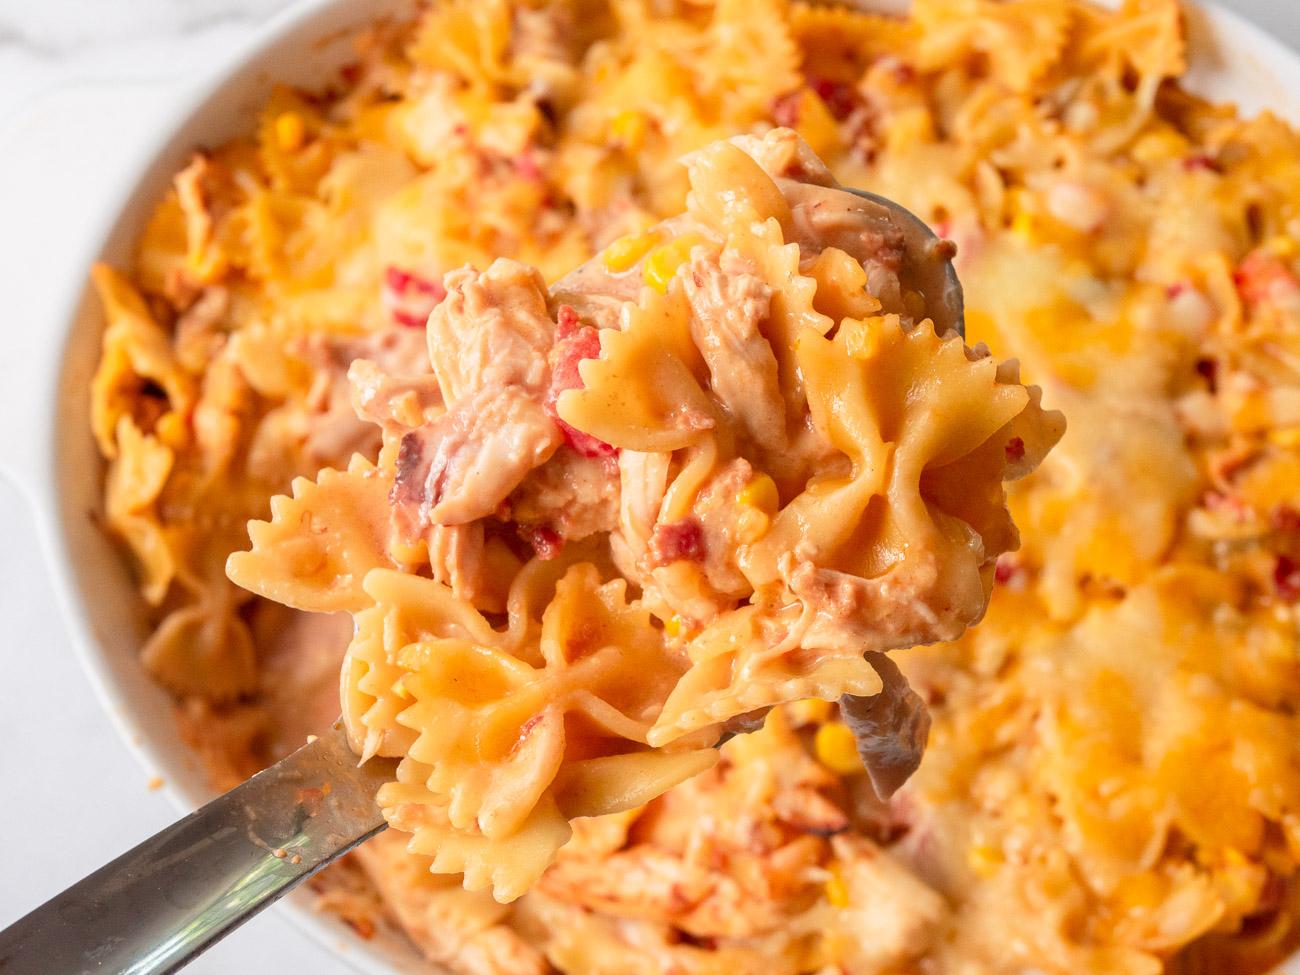 Close up of cheesy bowtie pasta casserole